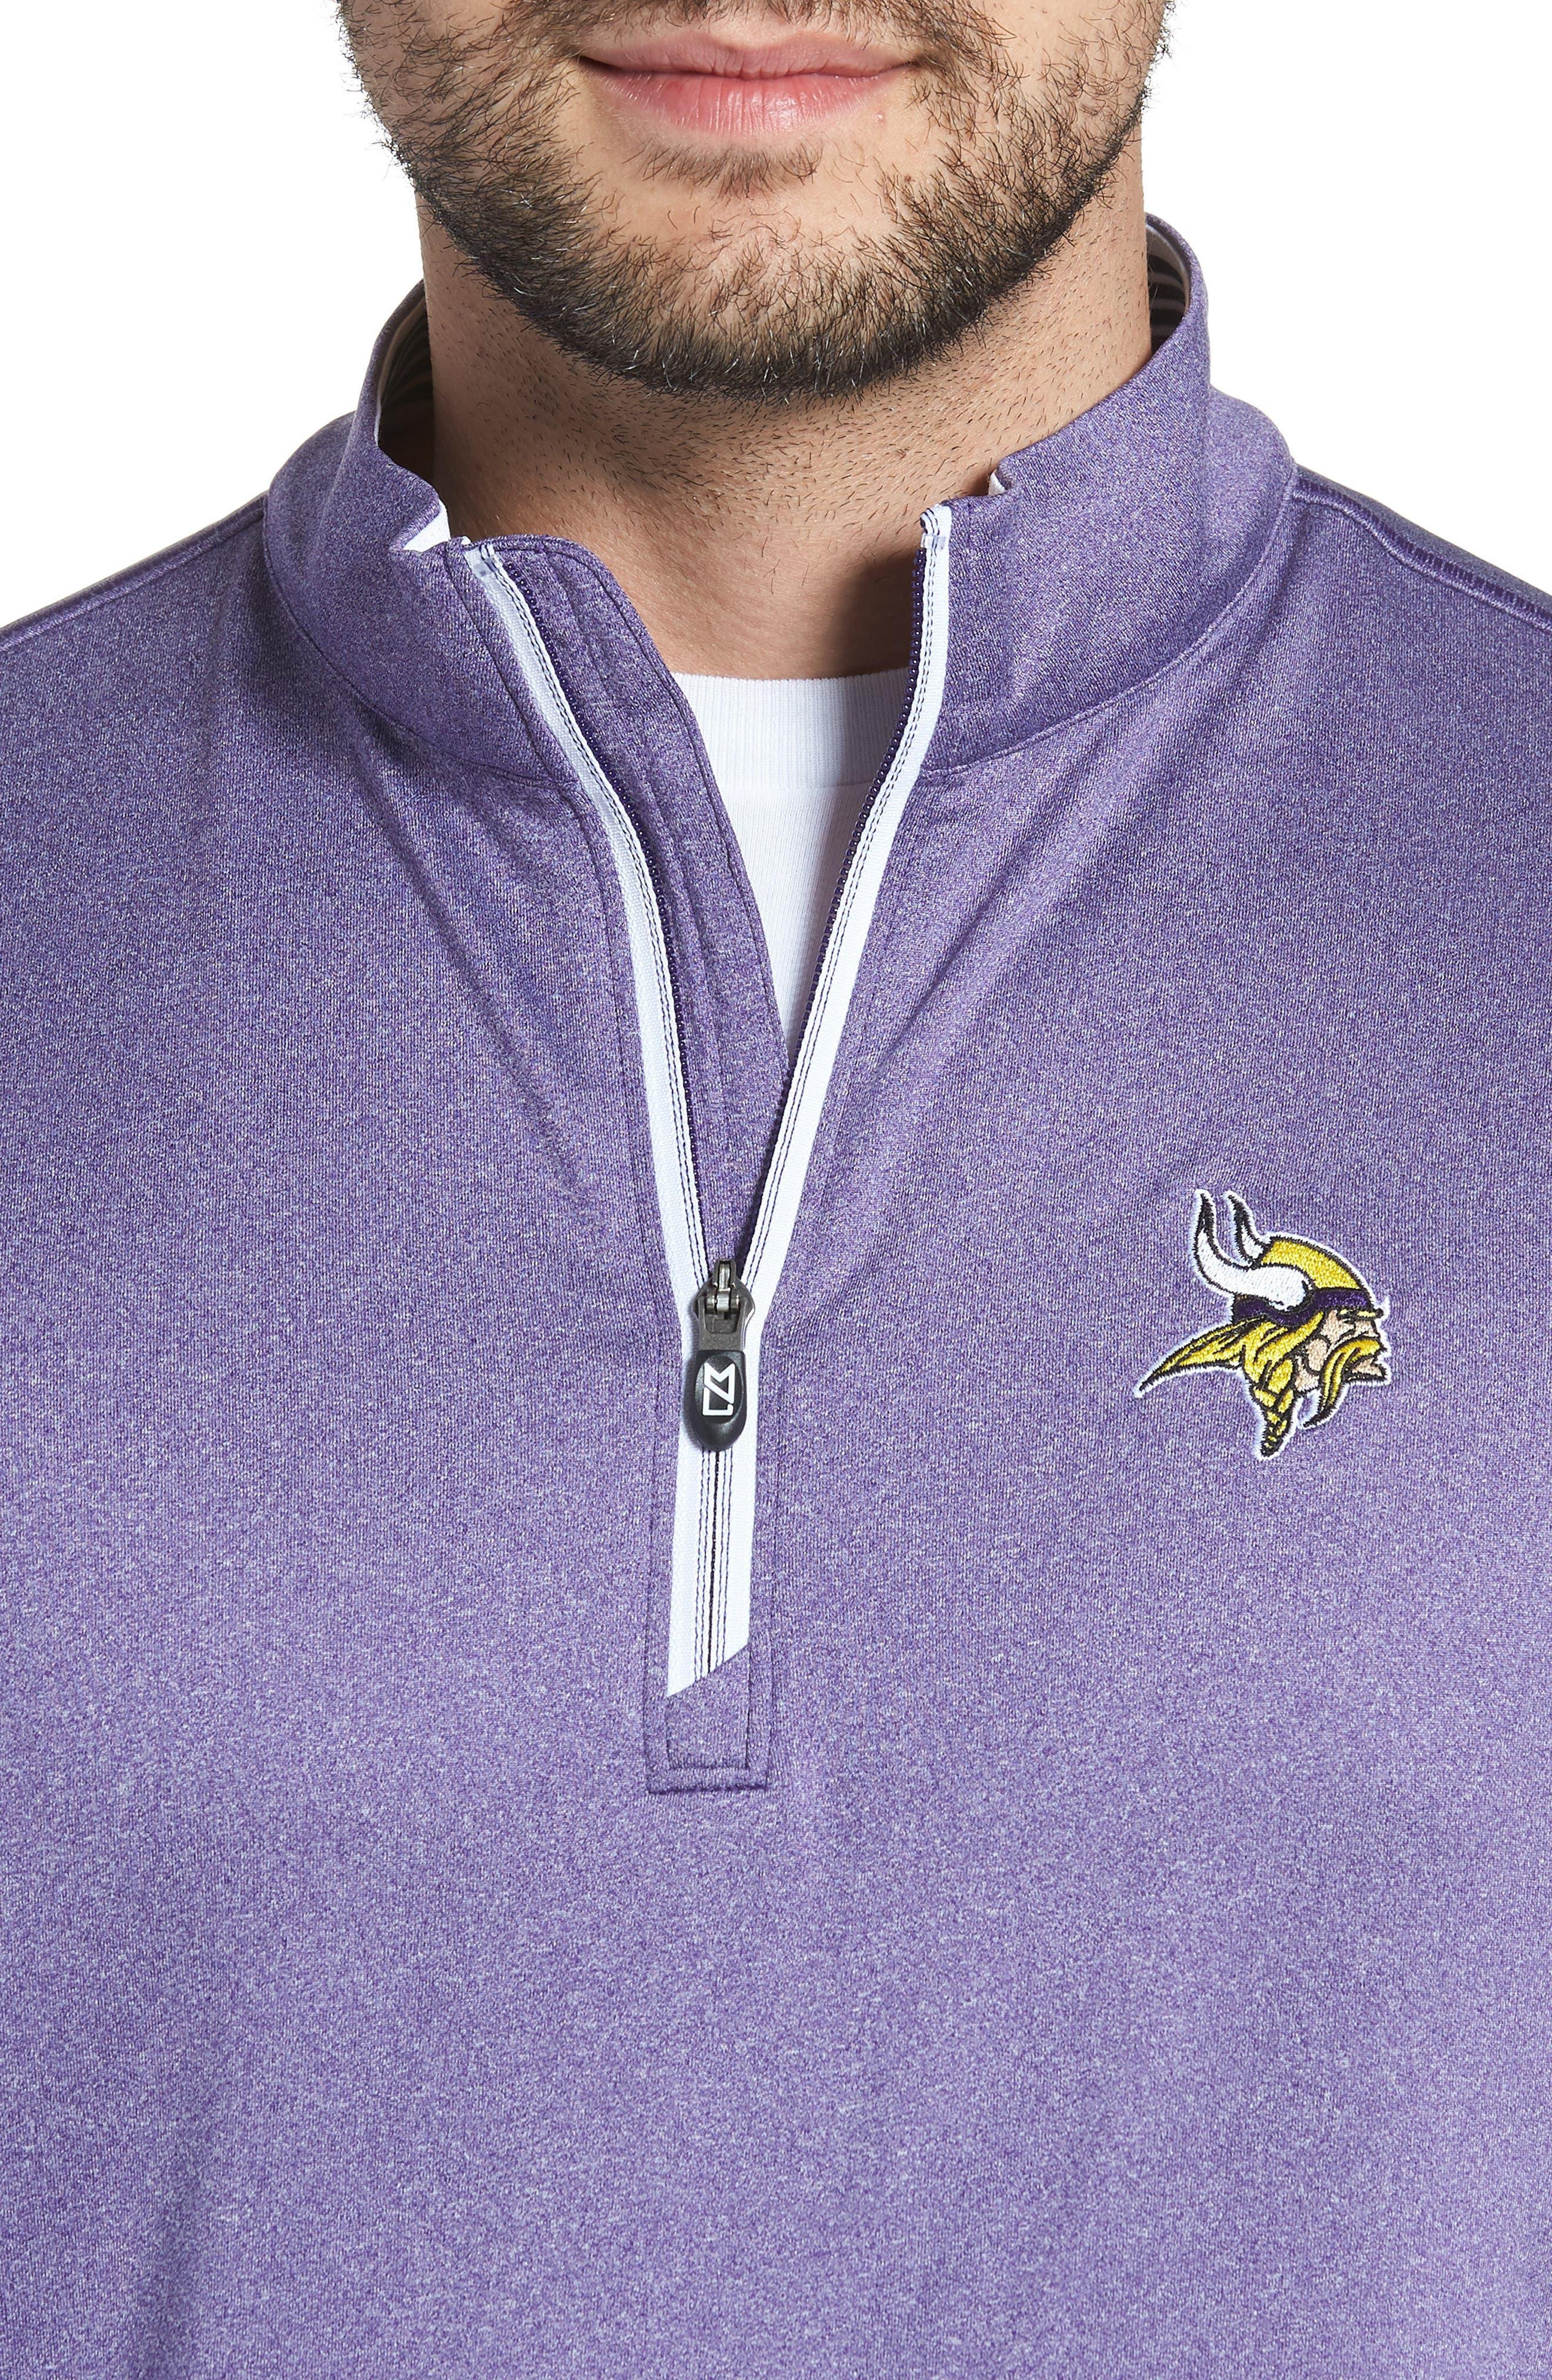 Endurance Minnesota Vikings Regular Fit Pullover,                             Alternate thumbnail 4, color,                             COLLEGE PURPLE HEATHER